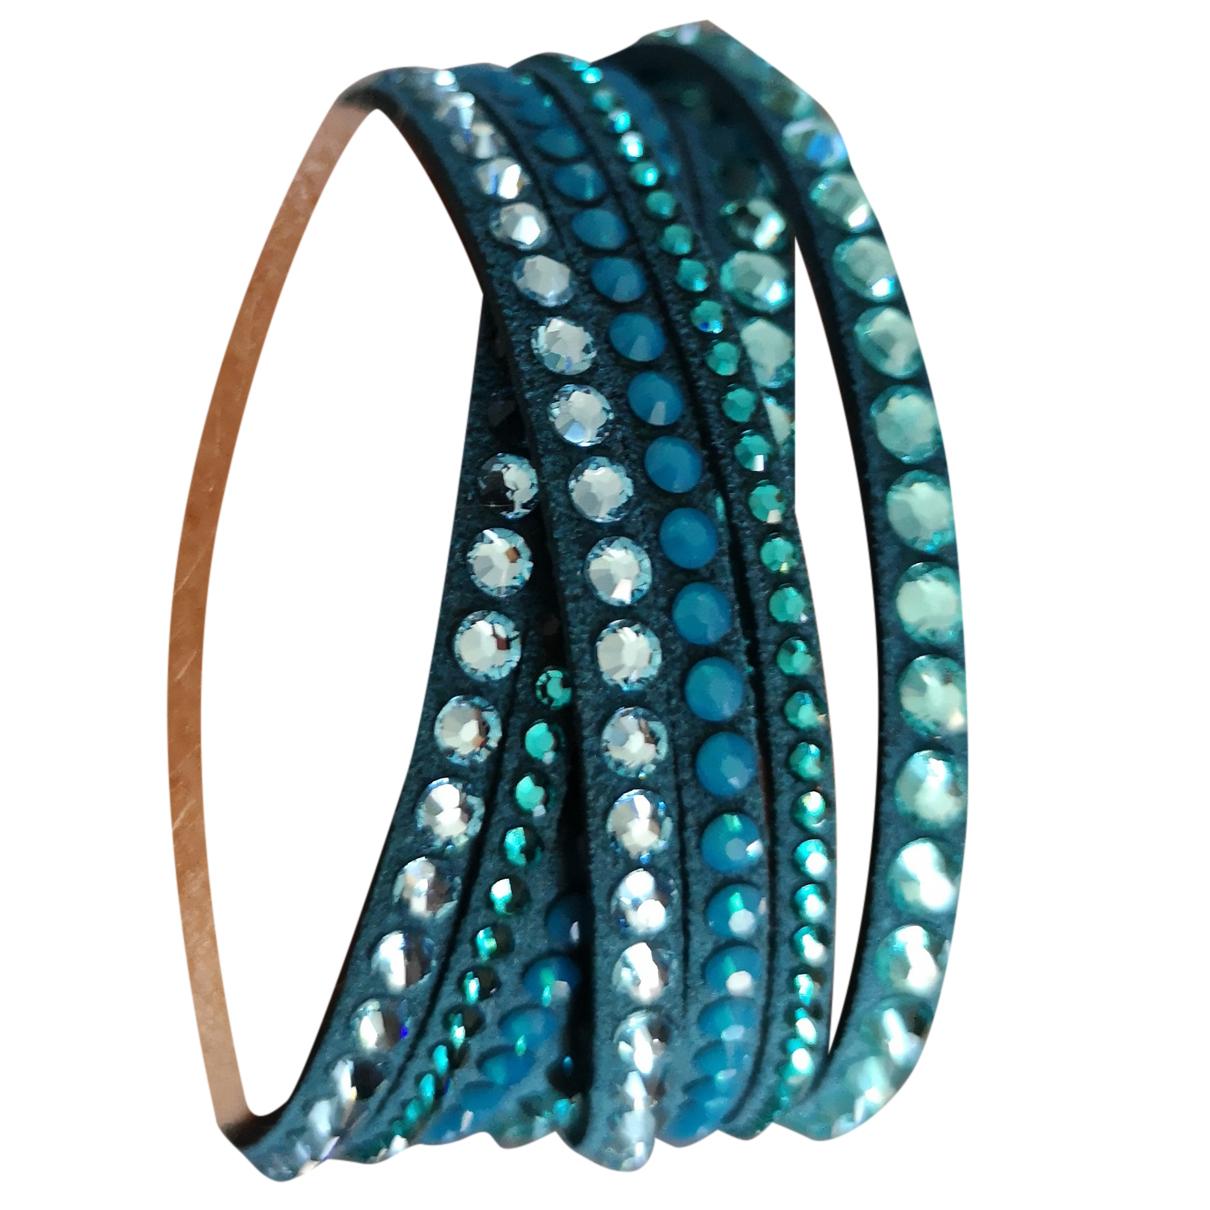 Swarovski Slake Armband in  Gruen Leder